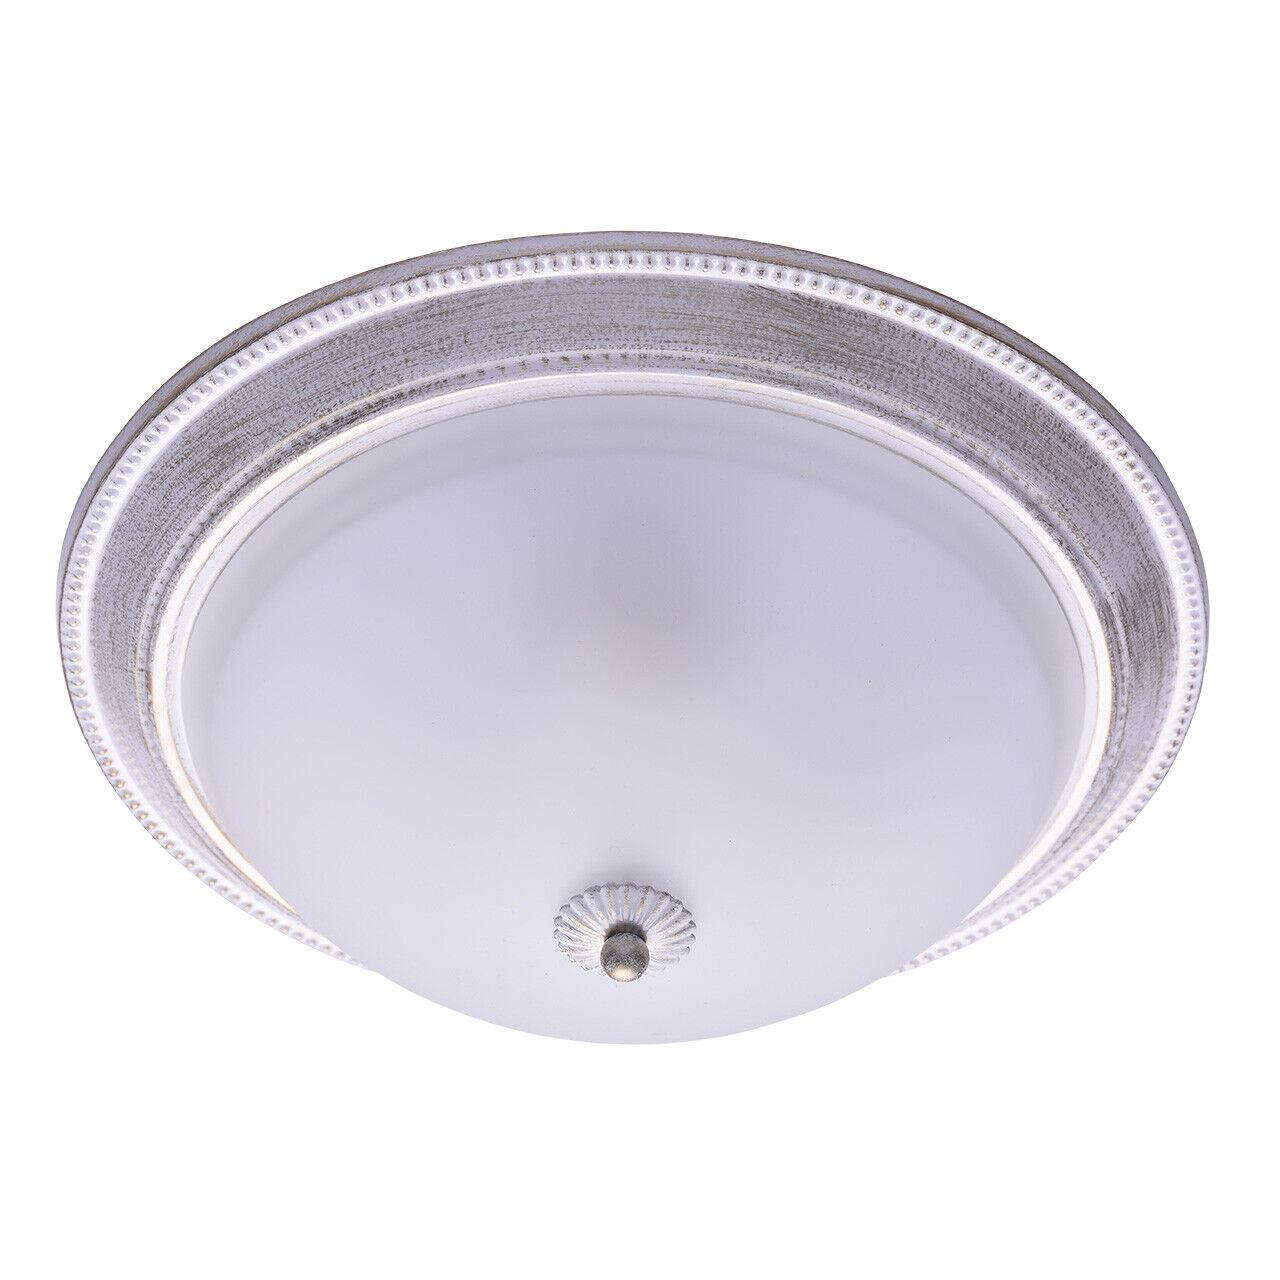 MW-Light Classic 450013403 Deckenlampe Deckenleuchte Lampe EEC  A++